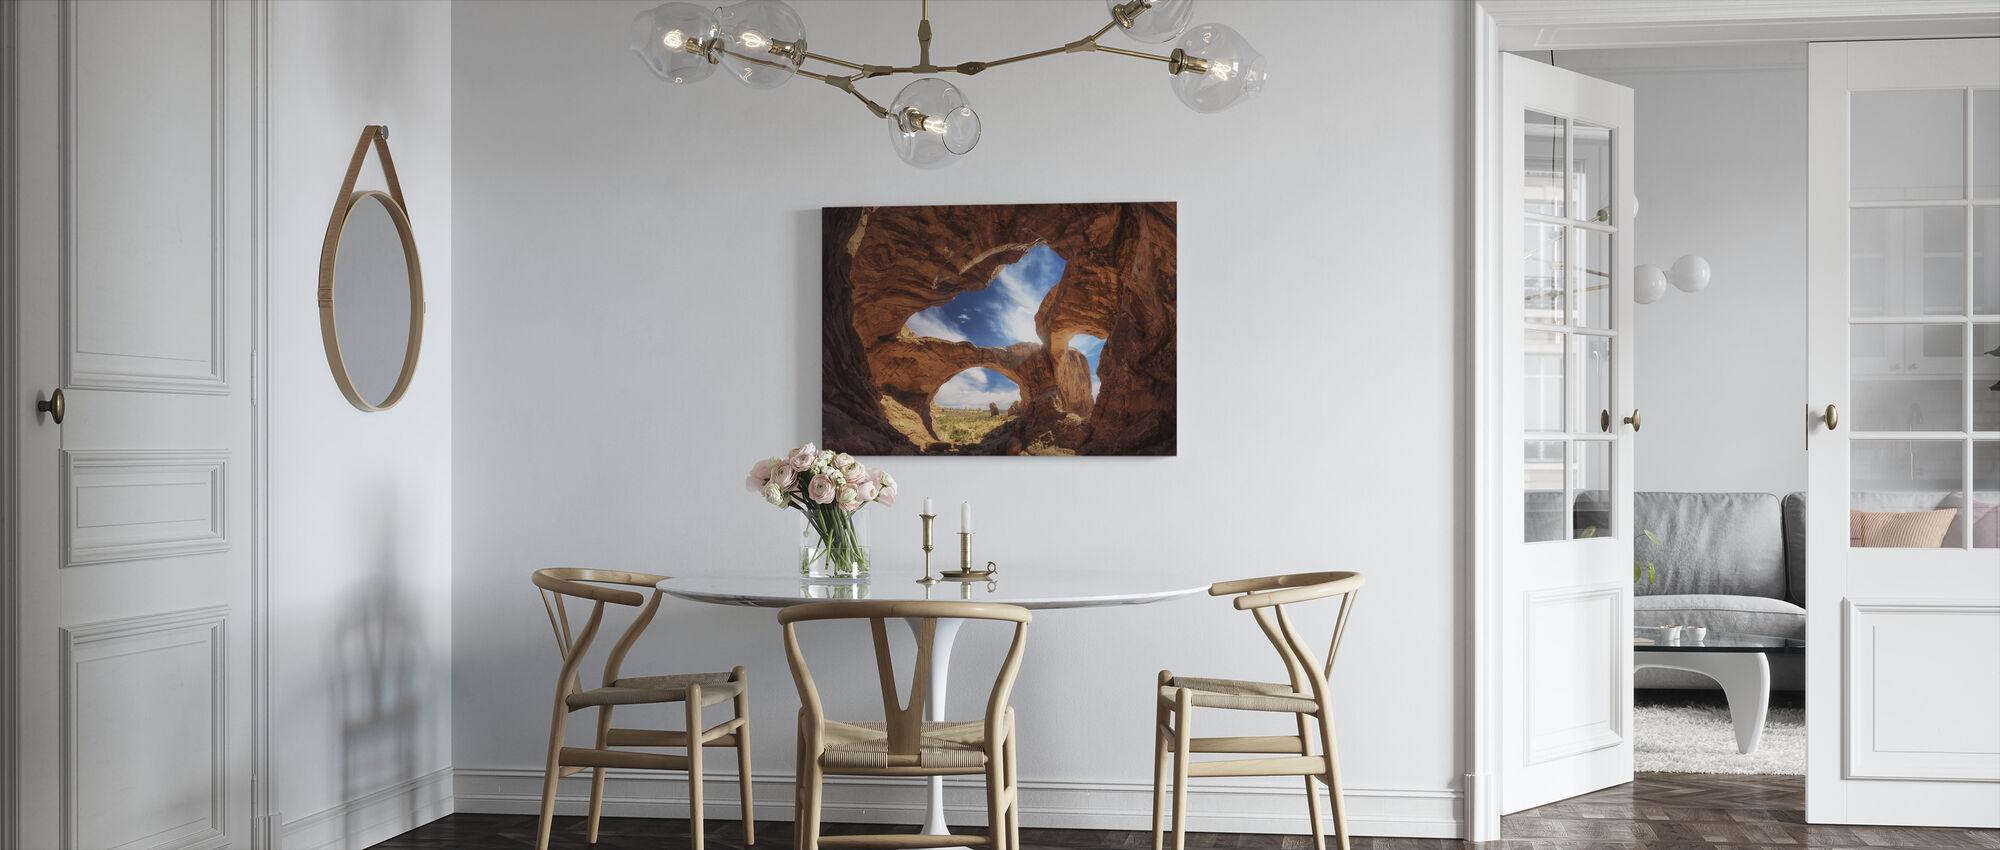 Double Arch - Canvas print - Kitchen